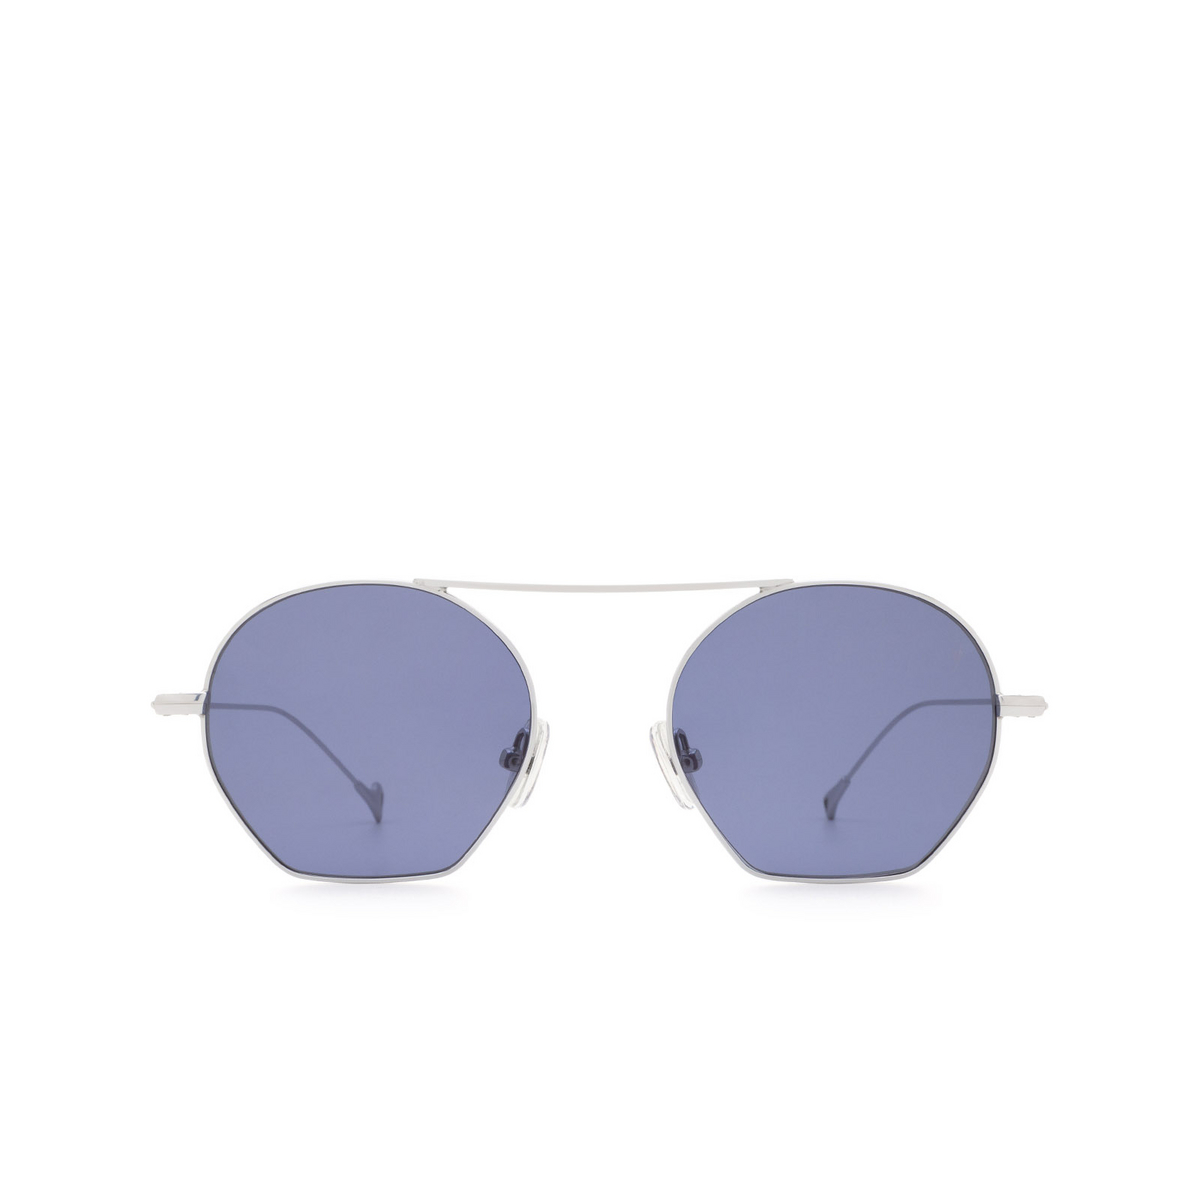 Eyepetizer® Irregular Sunglasses: Botafoch color Silver C.1-39 - front view.